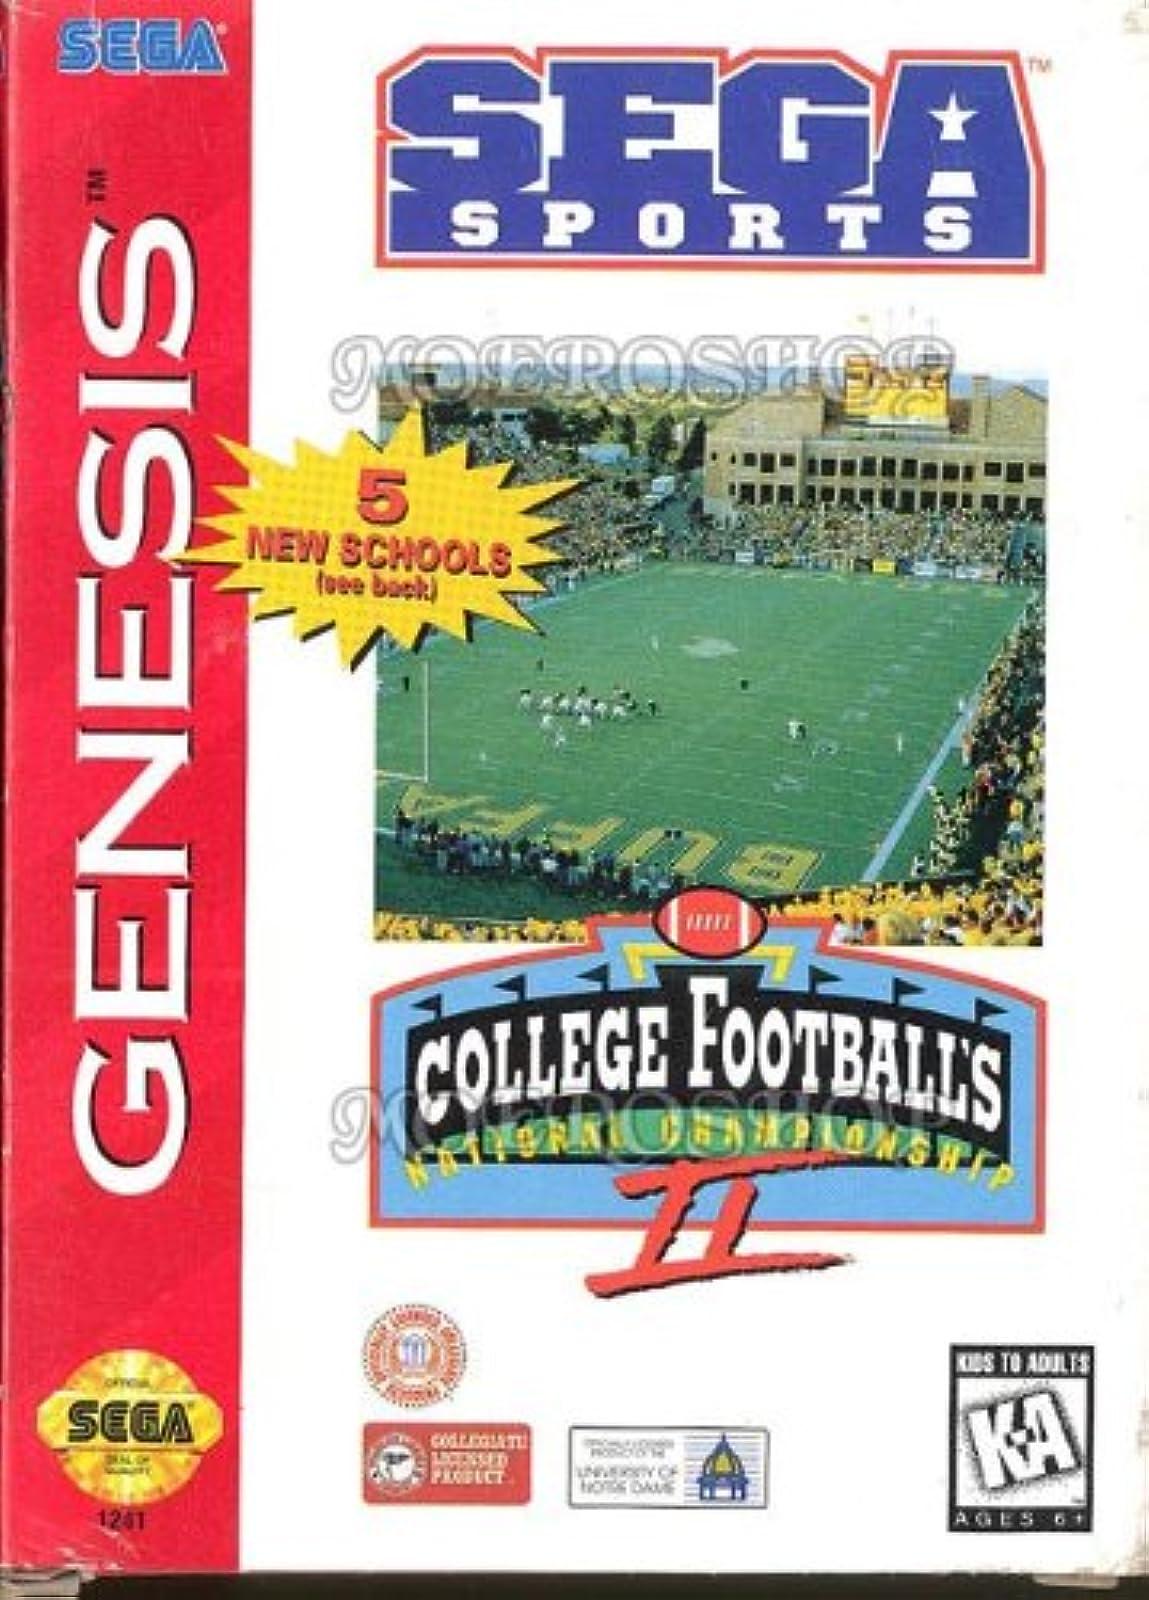 College Football's National Championship II For Sega Genesis Vintage